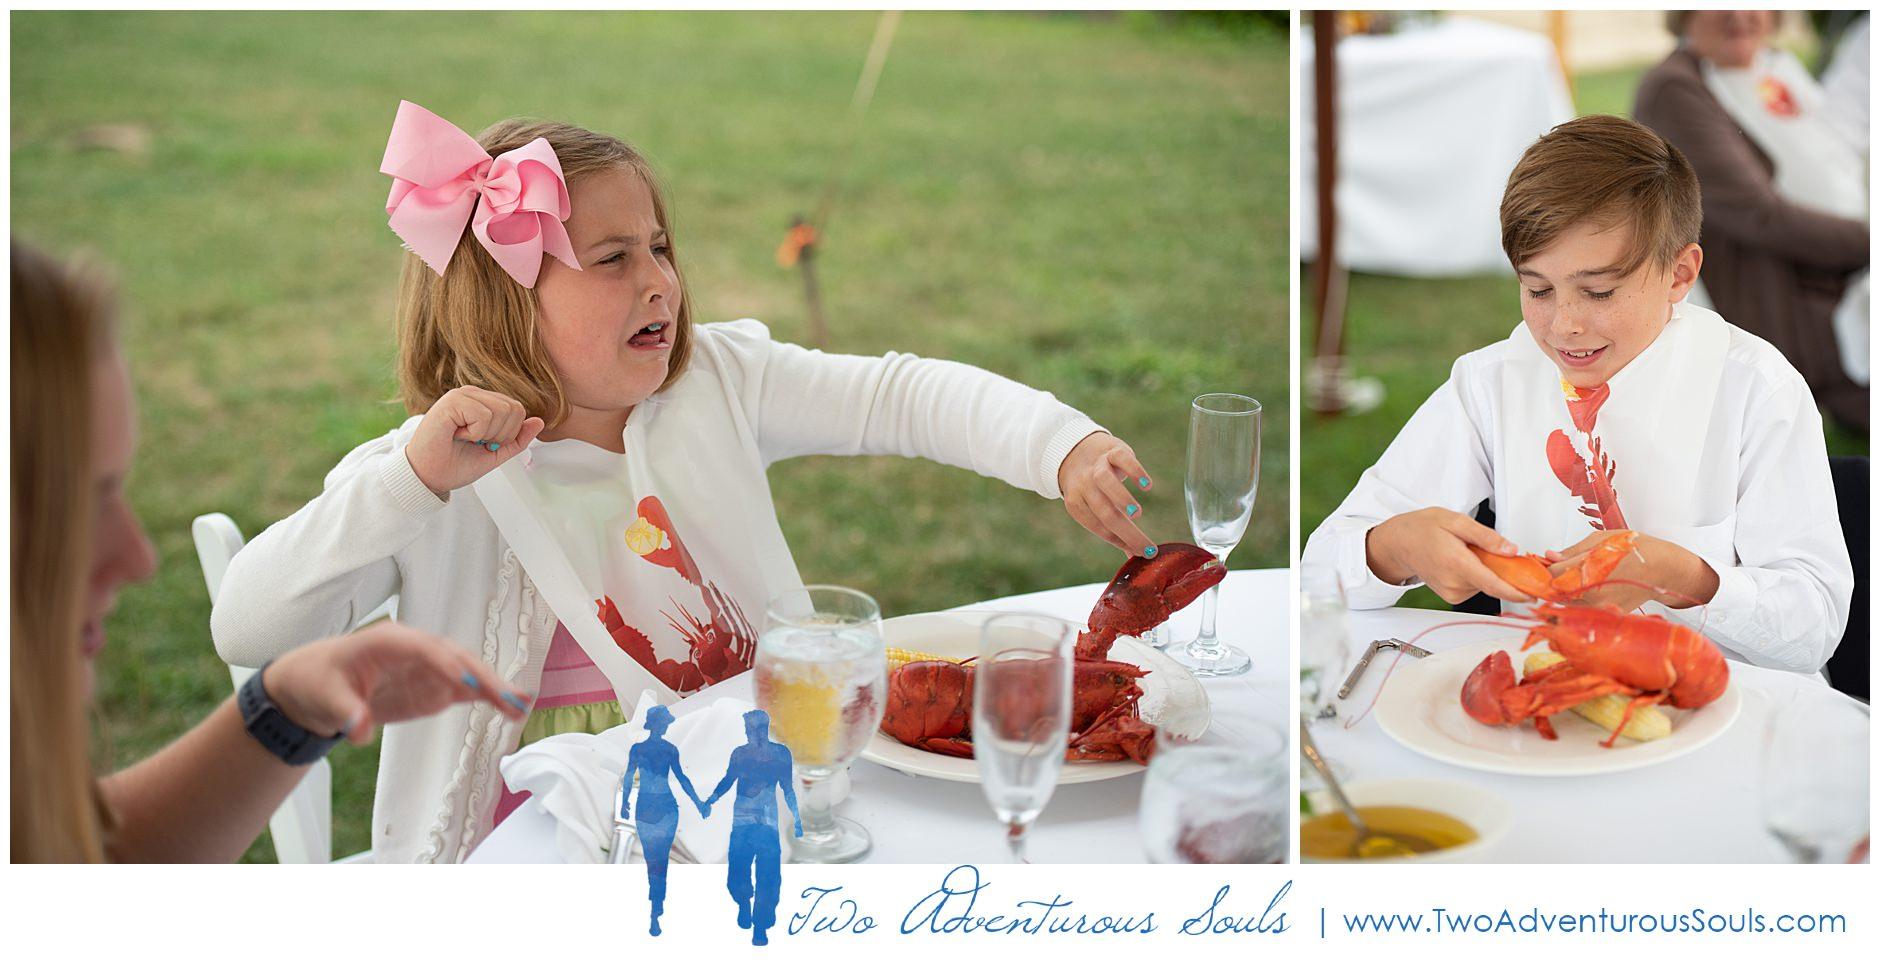 Chebeague Island Inn Wedding Photograpehrs, Maine Wedding Photographers, Two Adventurous Souls-082419_0015.jpg